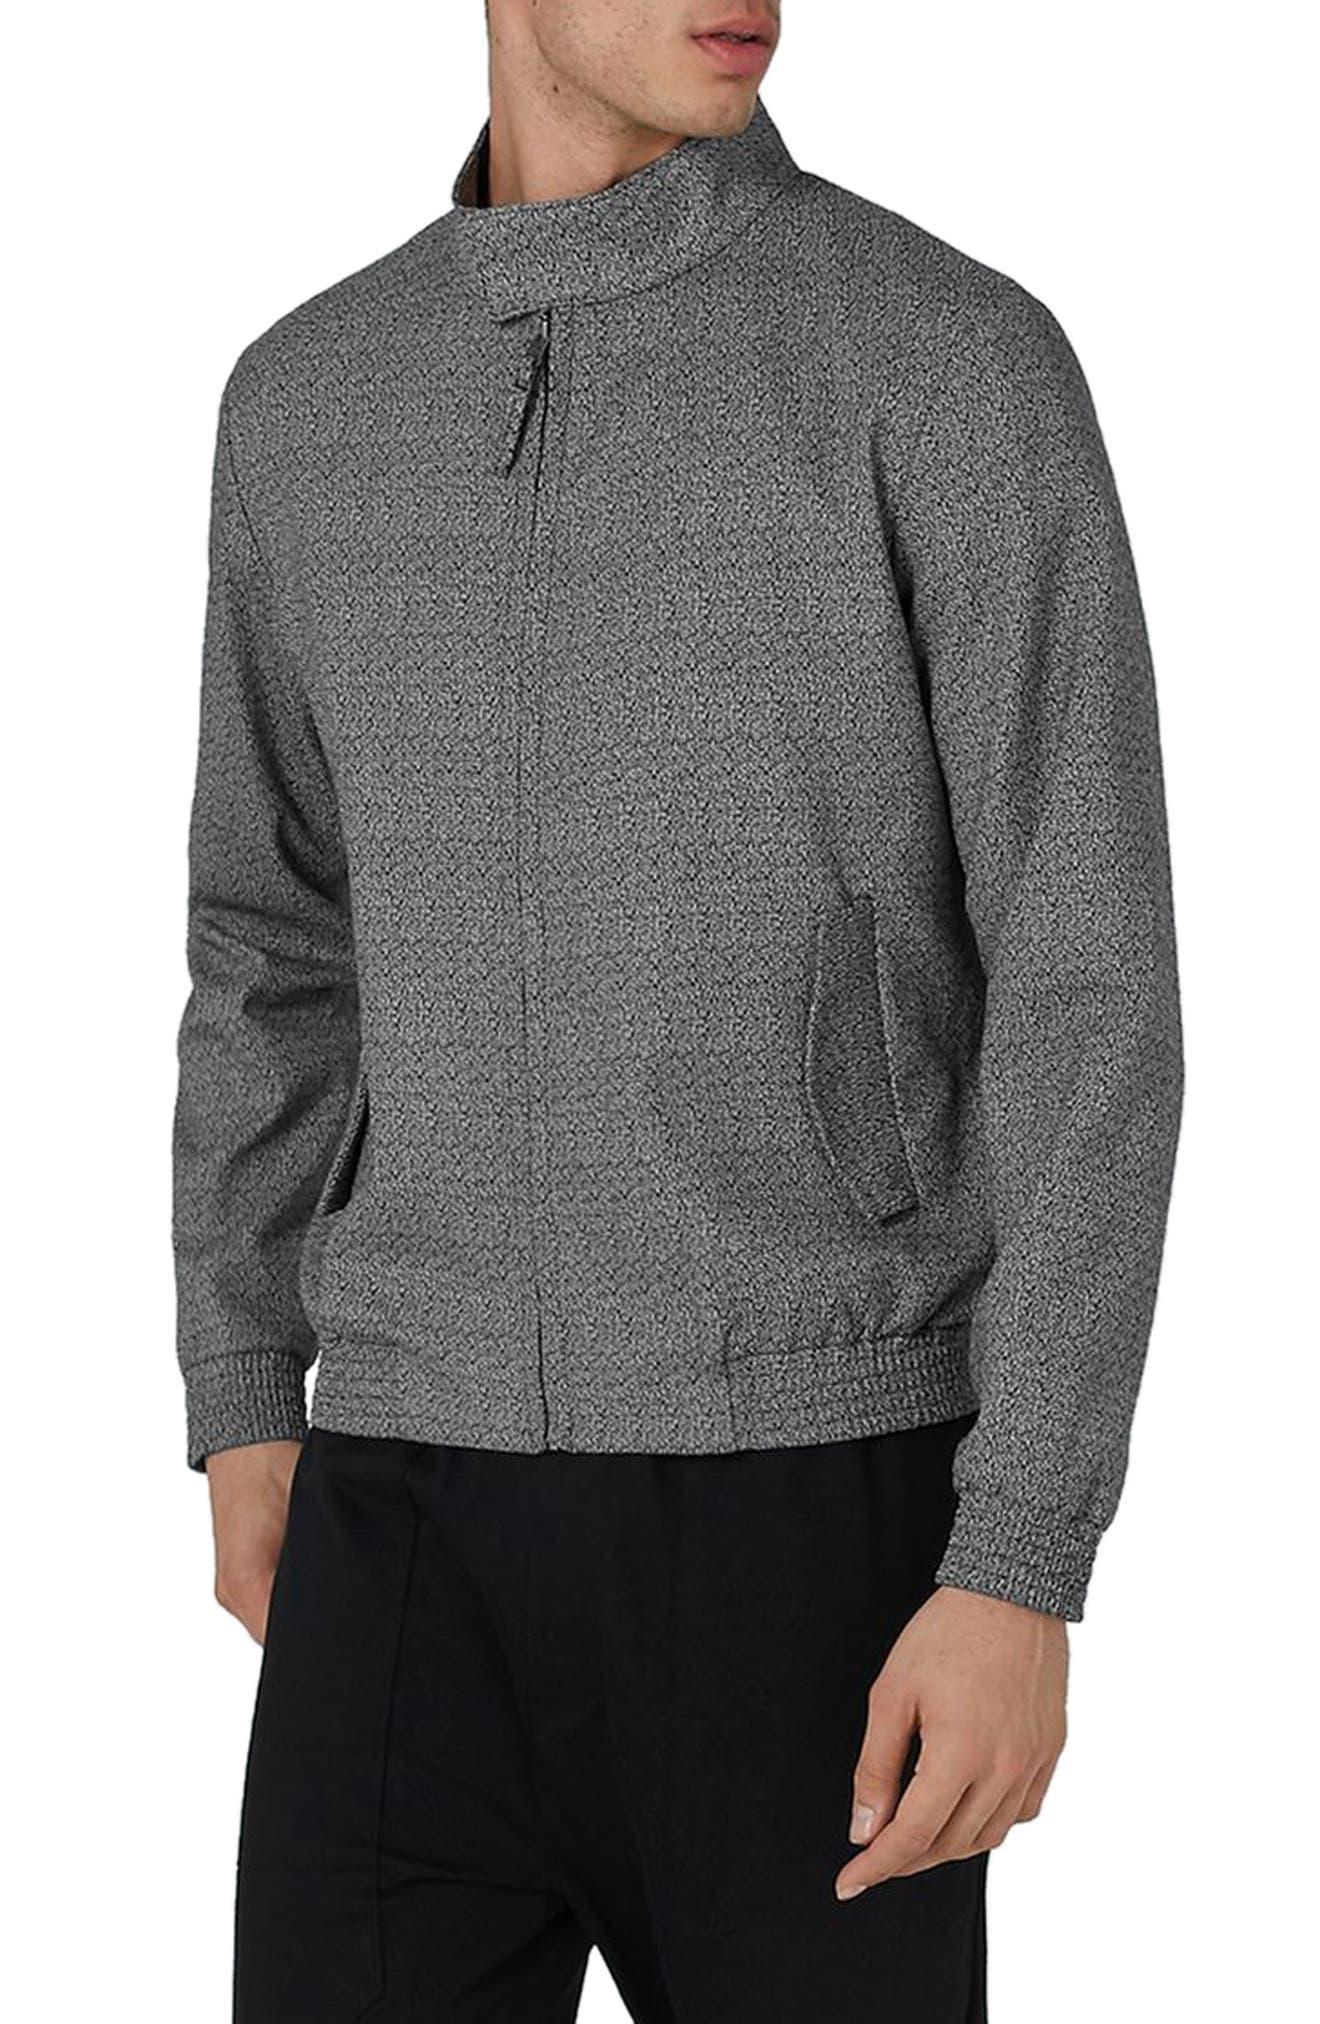 Alternate Image 1 Selected - Topman Textured Harrington Jacket